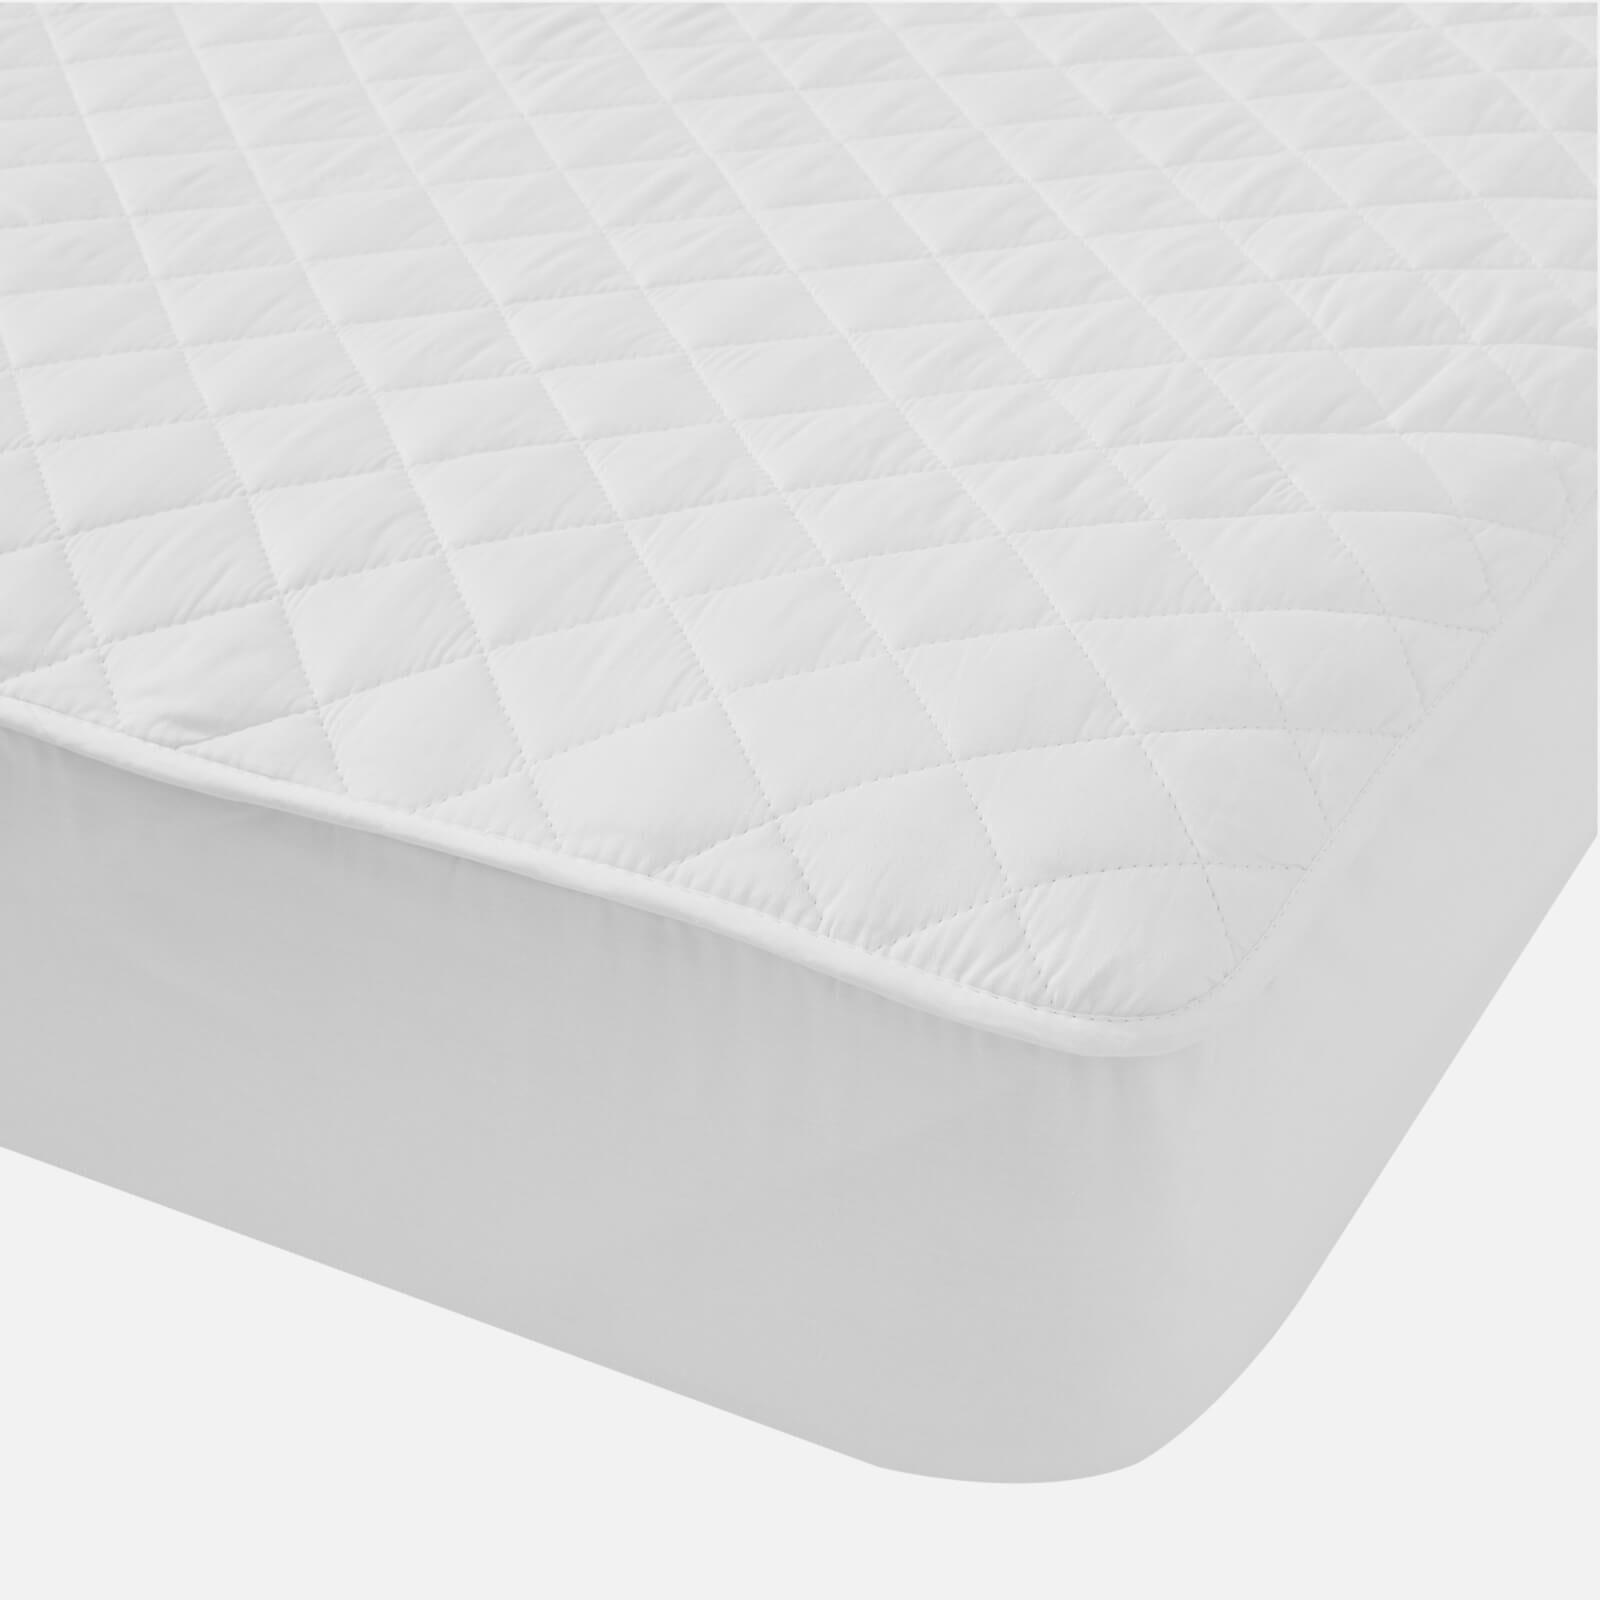 in homeware Cotton Mattress Protector - White - King